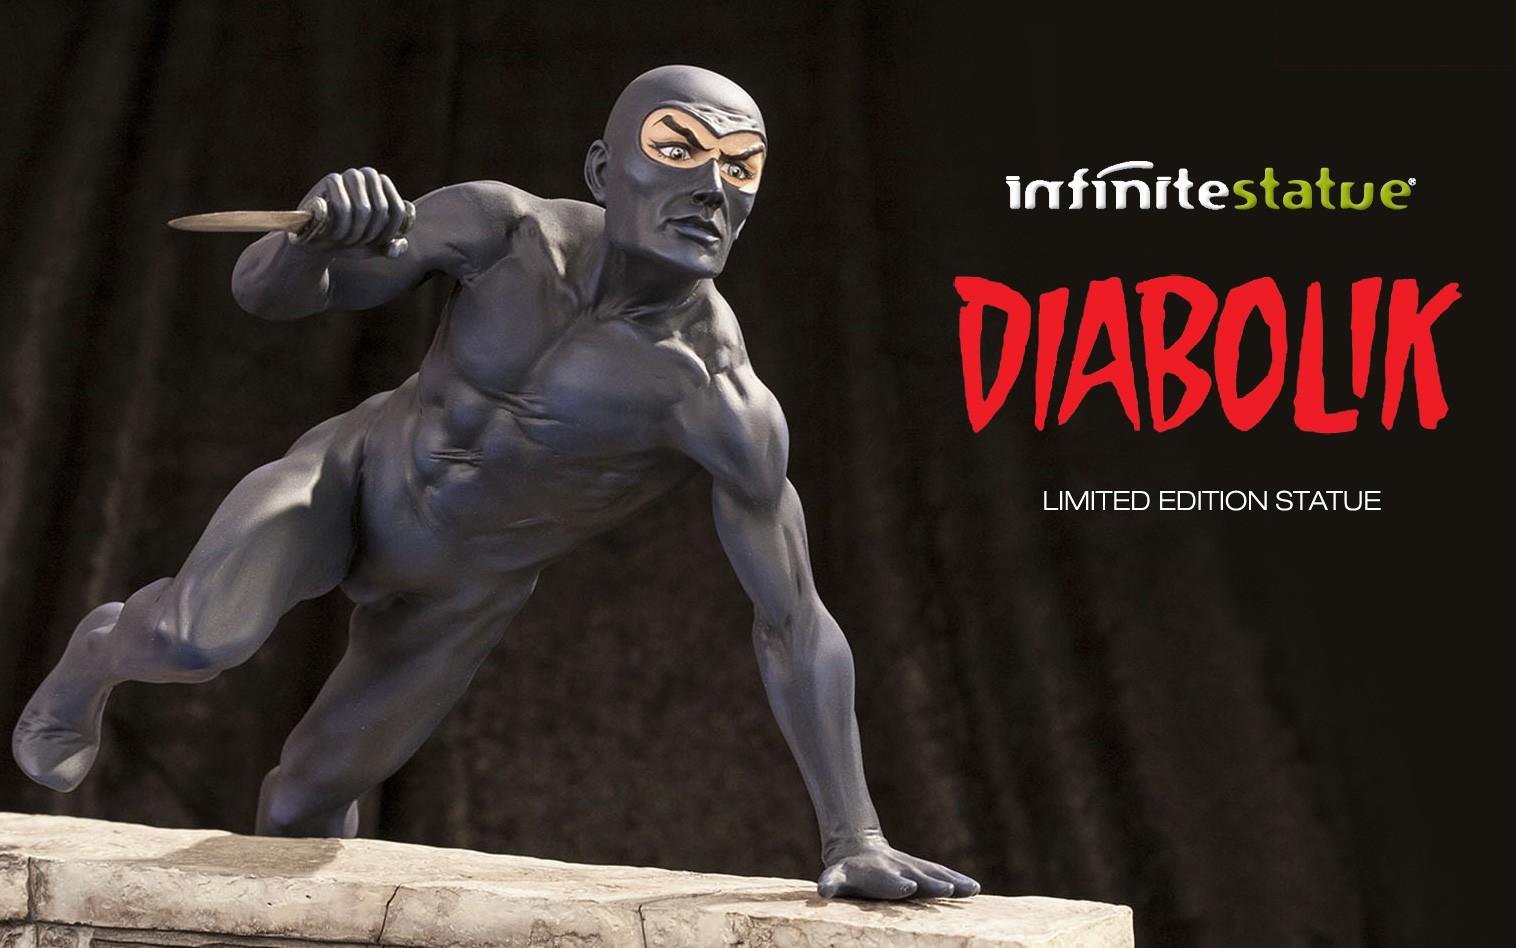 diabolik_slide